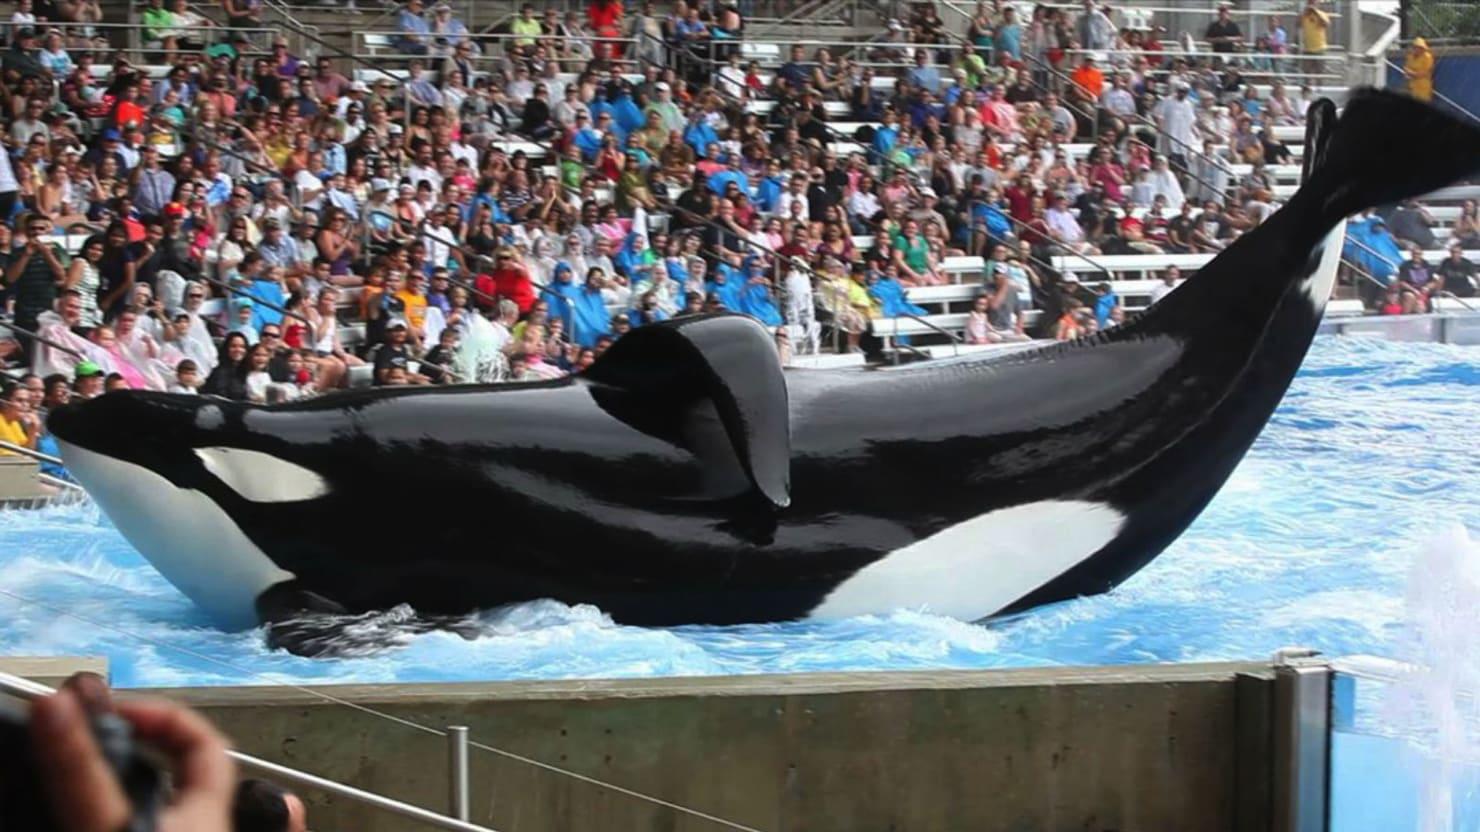 'Blackfish' Director: Killer Whales Don't Belong in Captivity